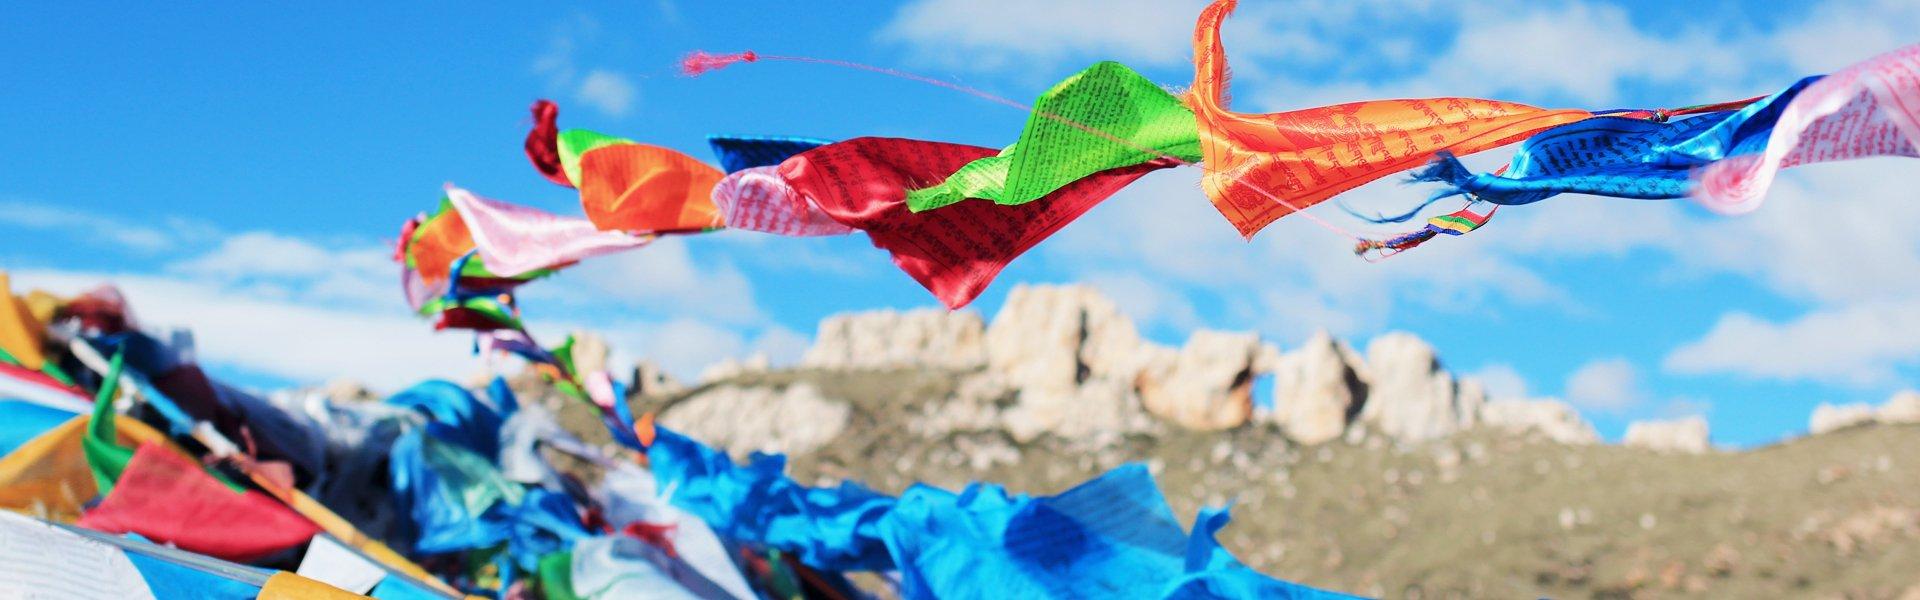 Gebedsvlaggetjes, Bhutan